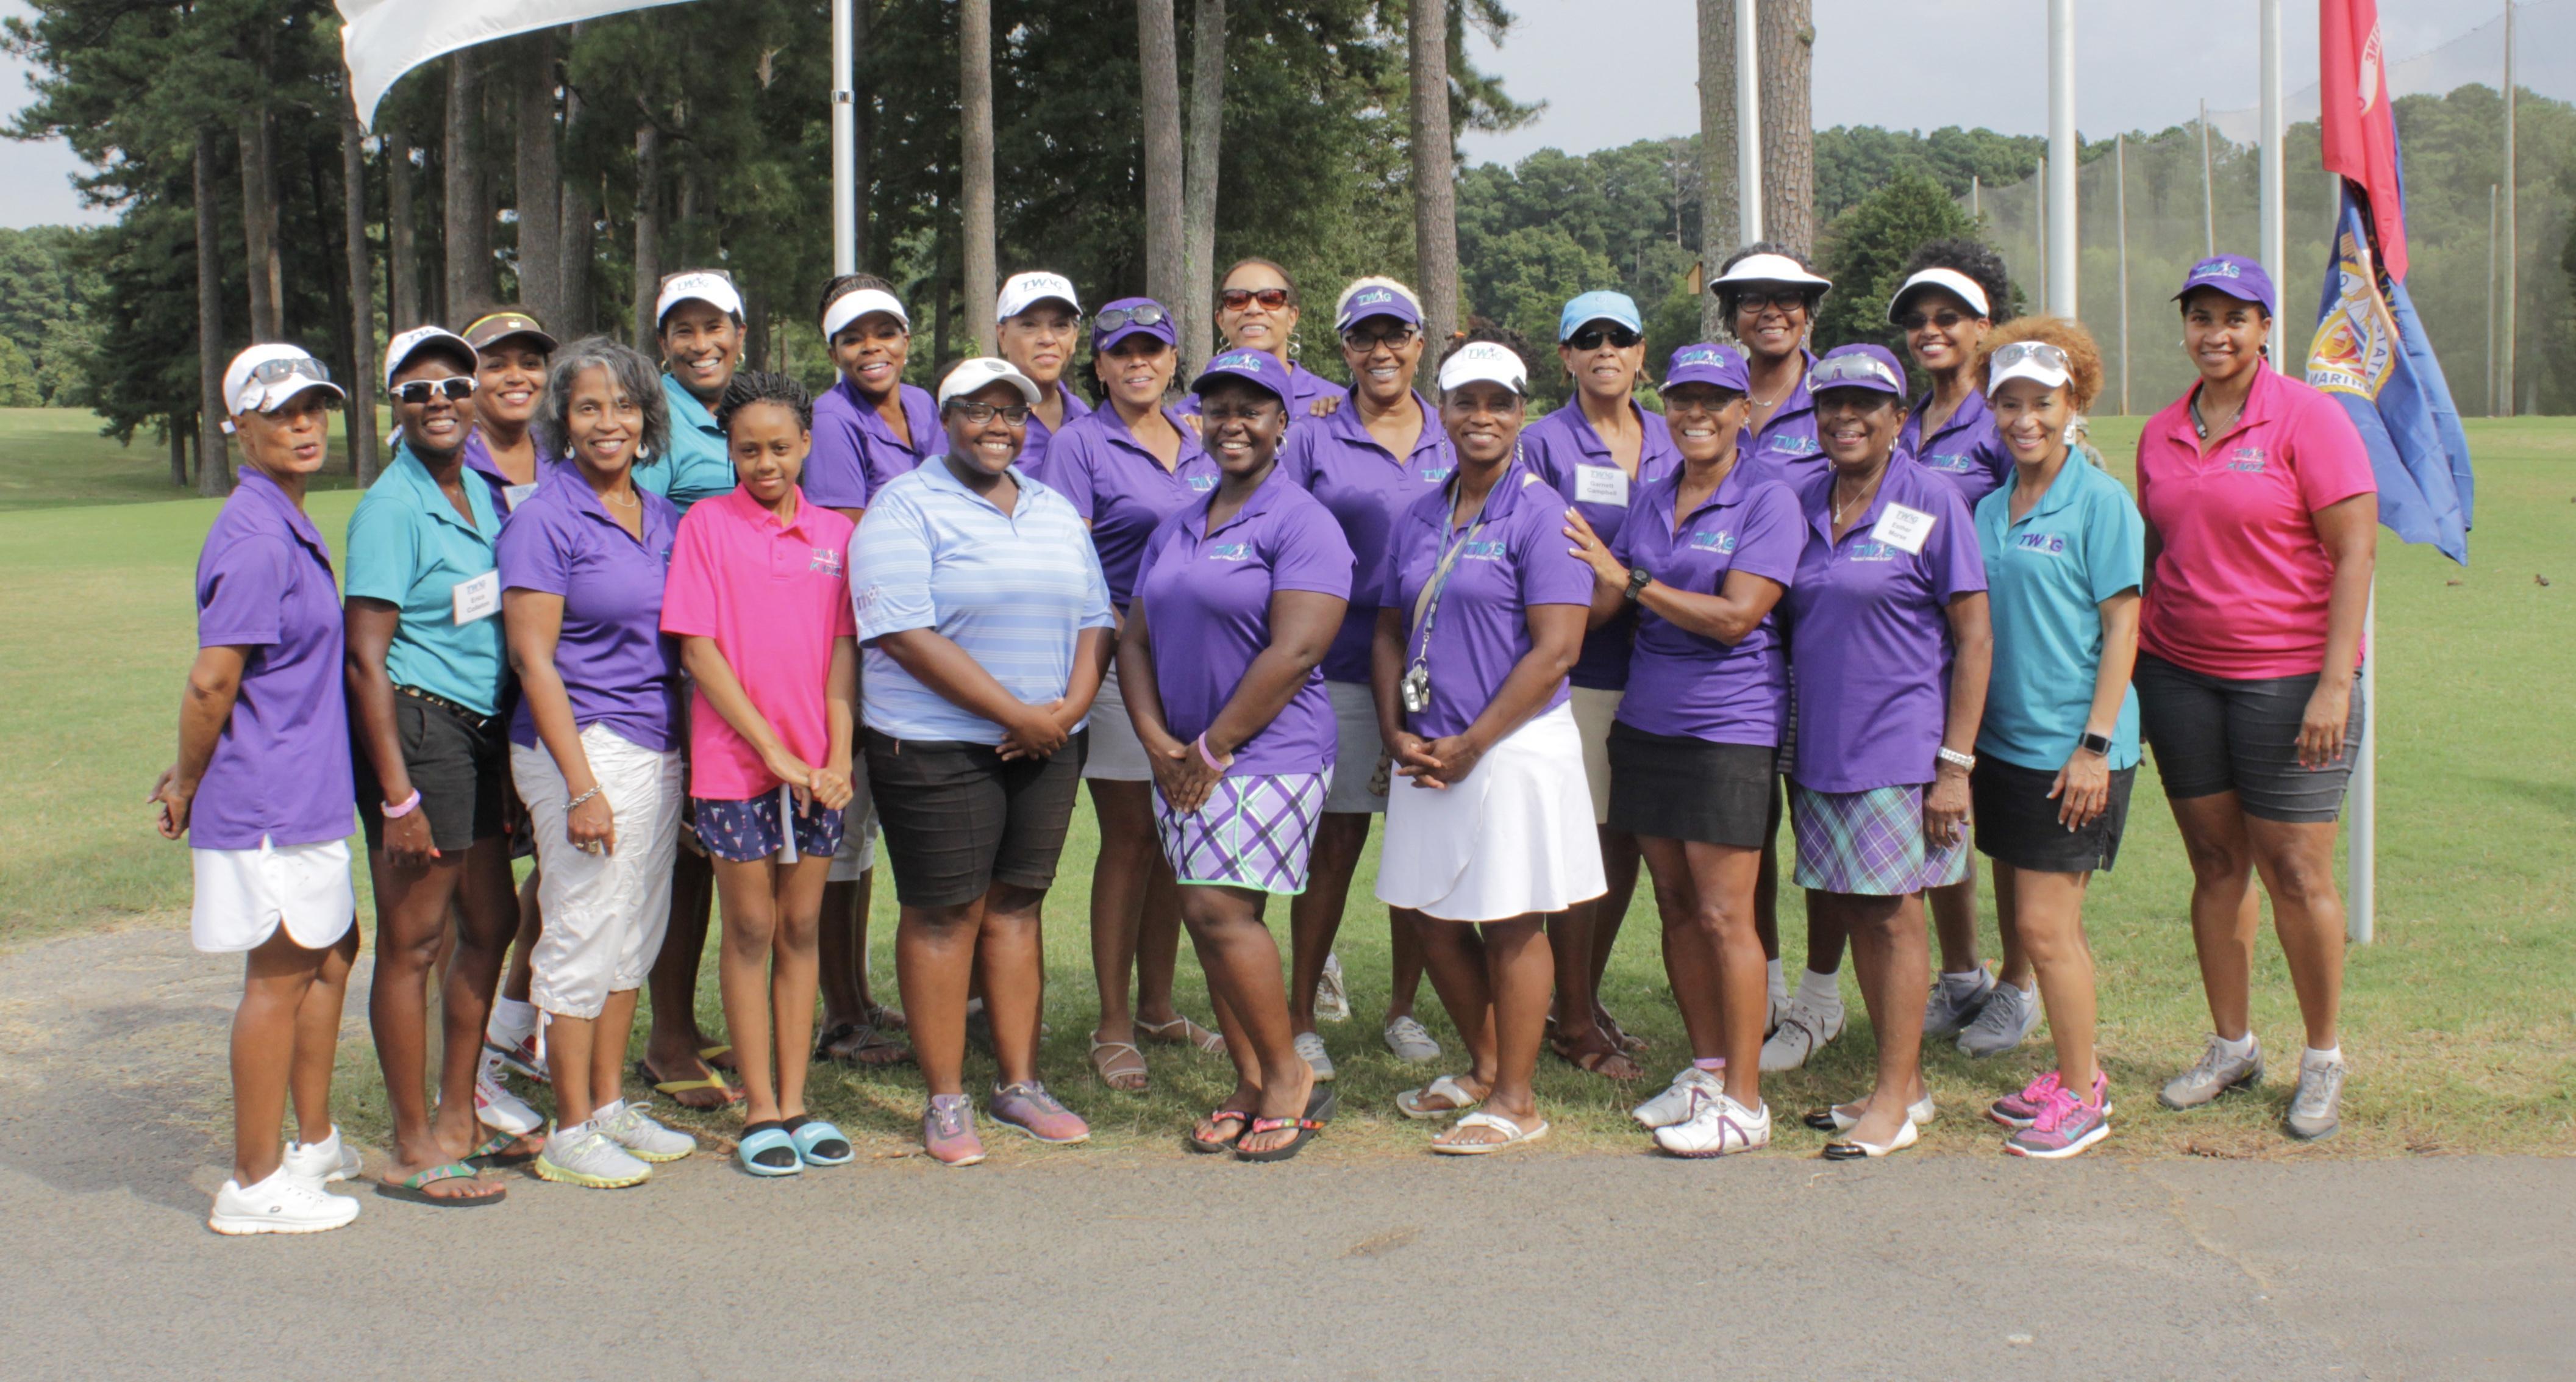 TWIG Foundation 16th Annual Invitational Golf Tournament